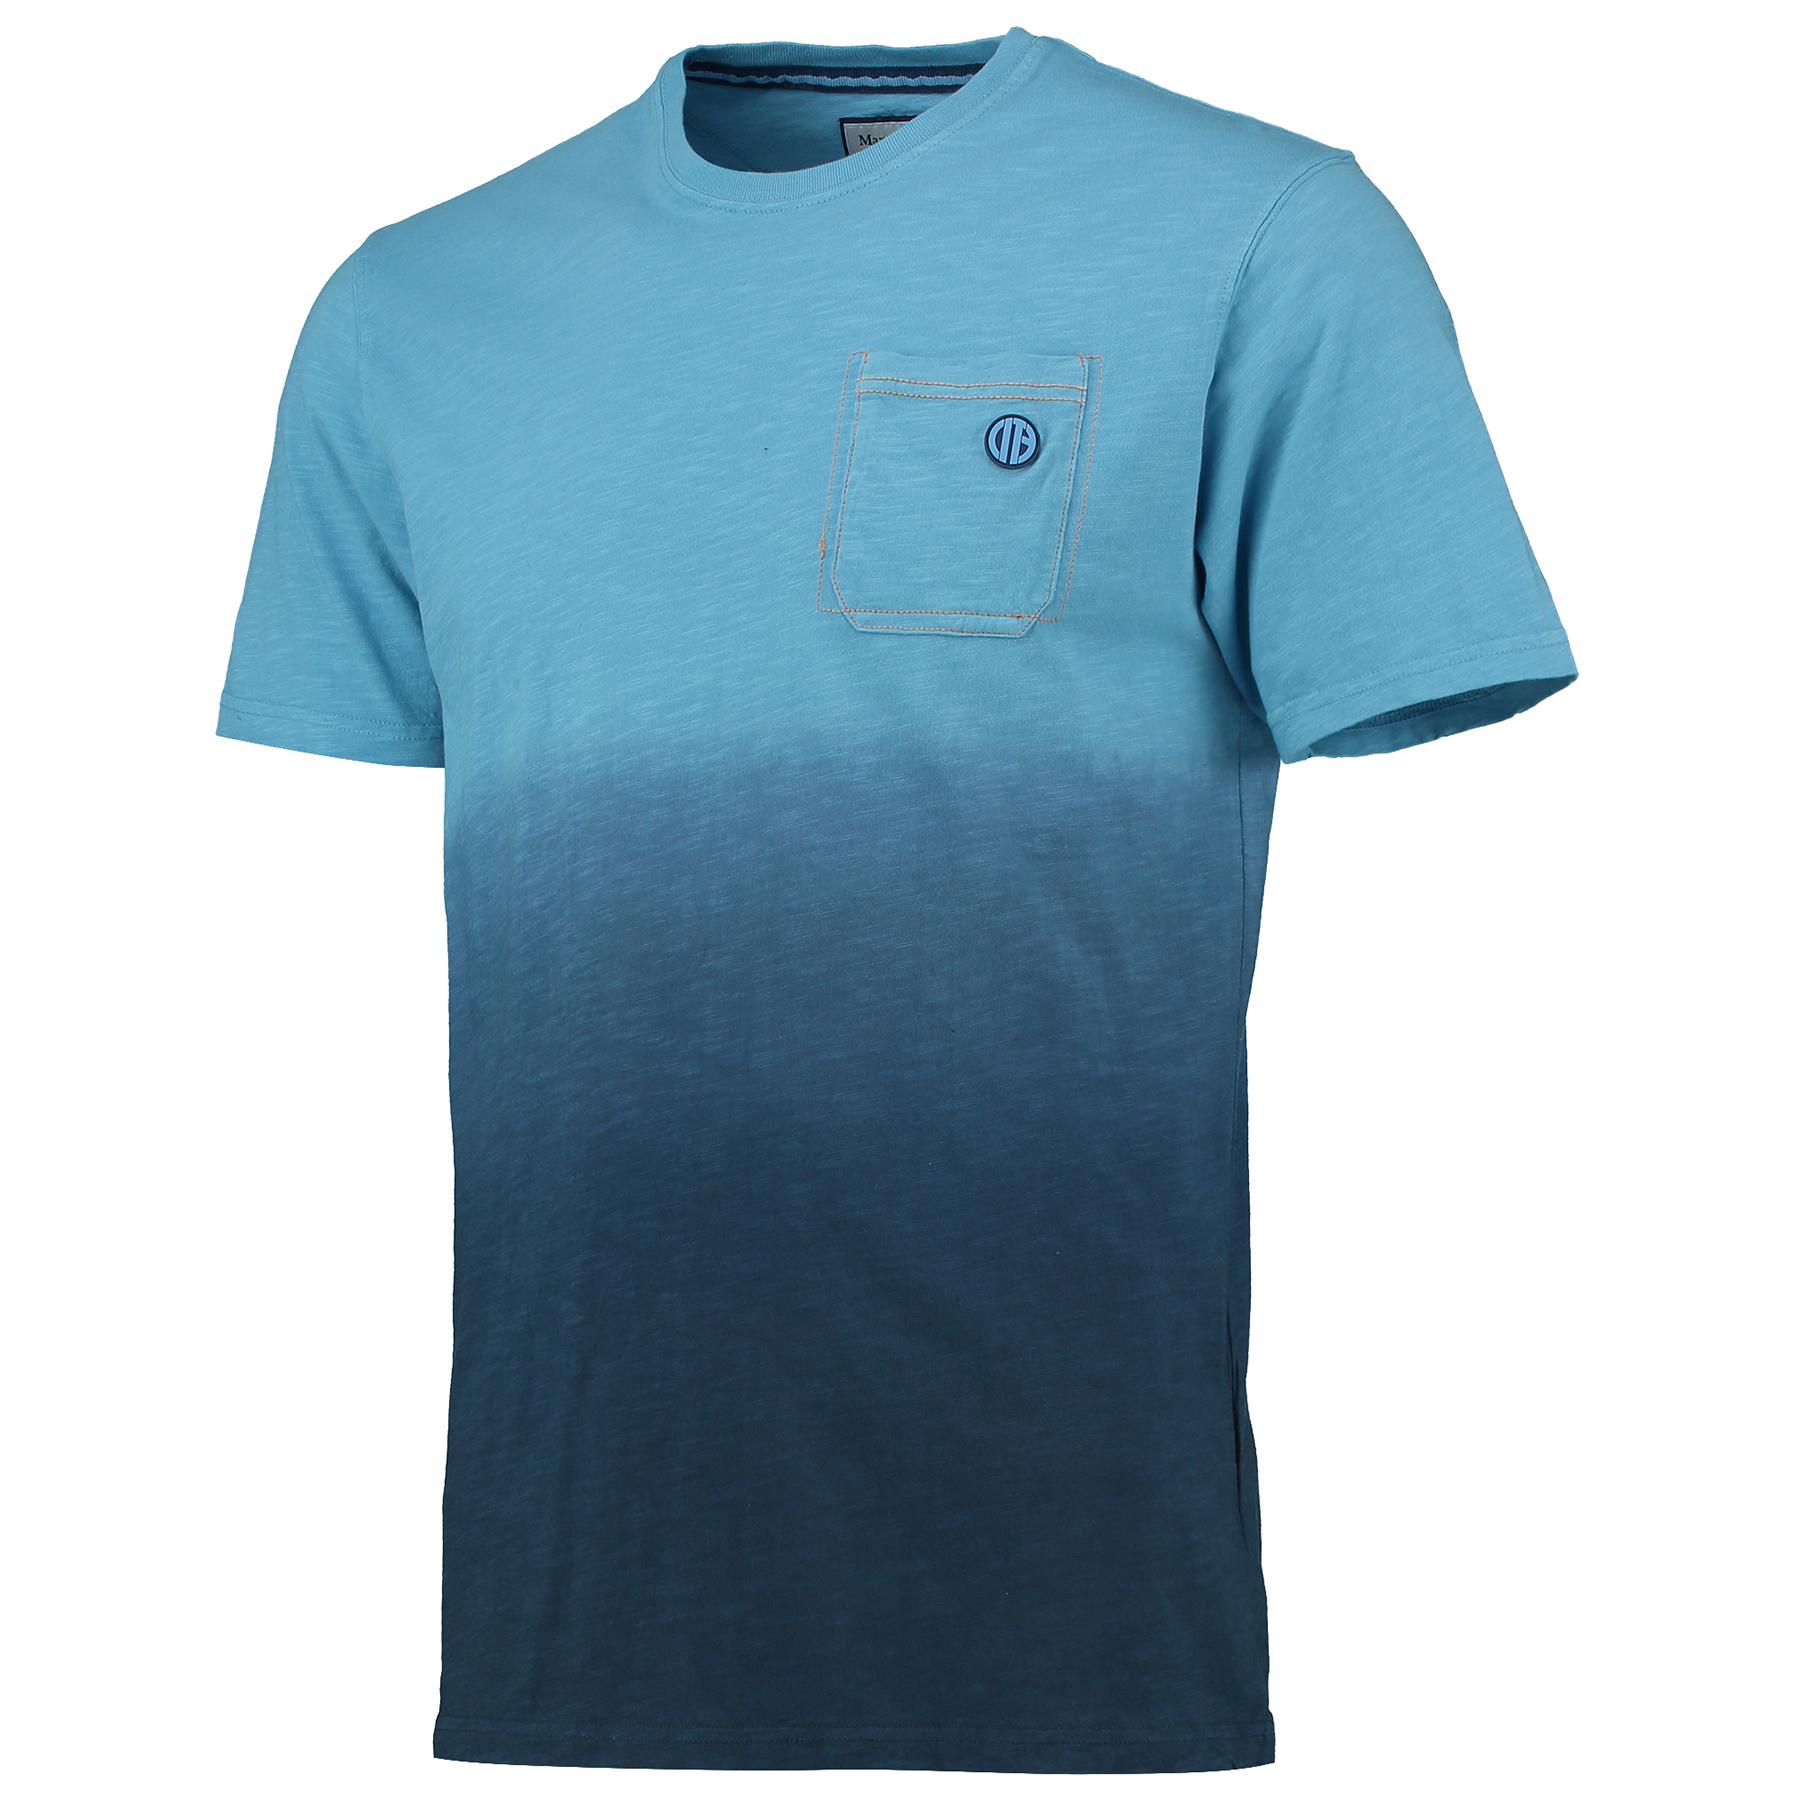 Manchester City Fade T-Shirt - Sky/Navy - Mens